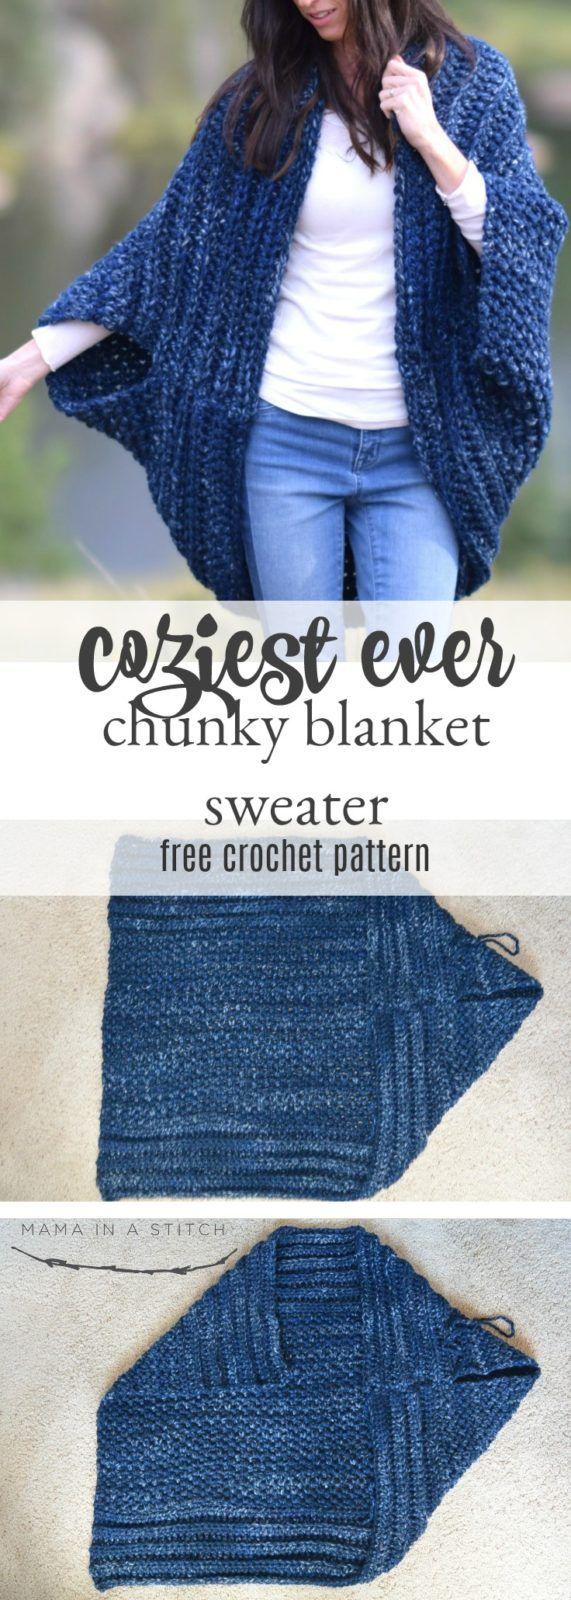 Easy-Free-Crocheted-Cocoon-Cardigan-Pattern.jpg (571×1600)